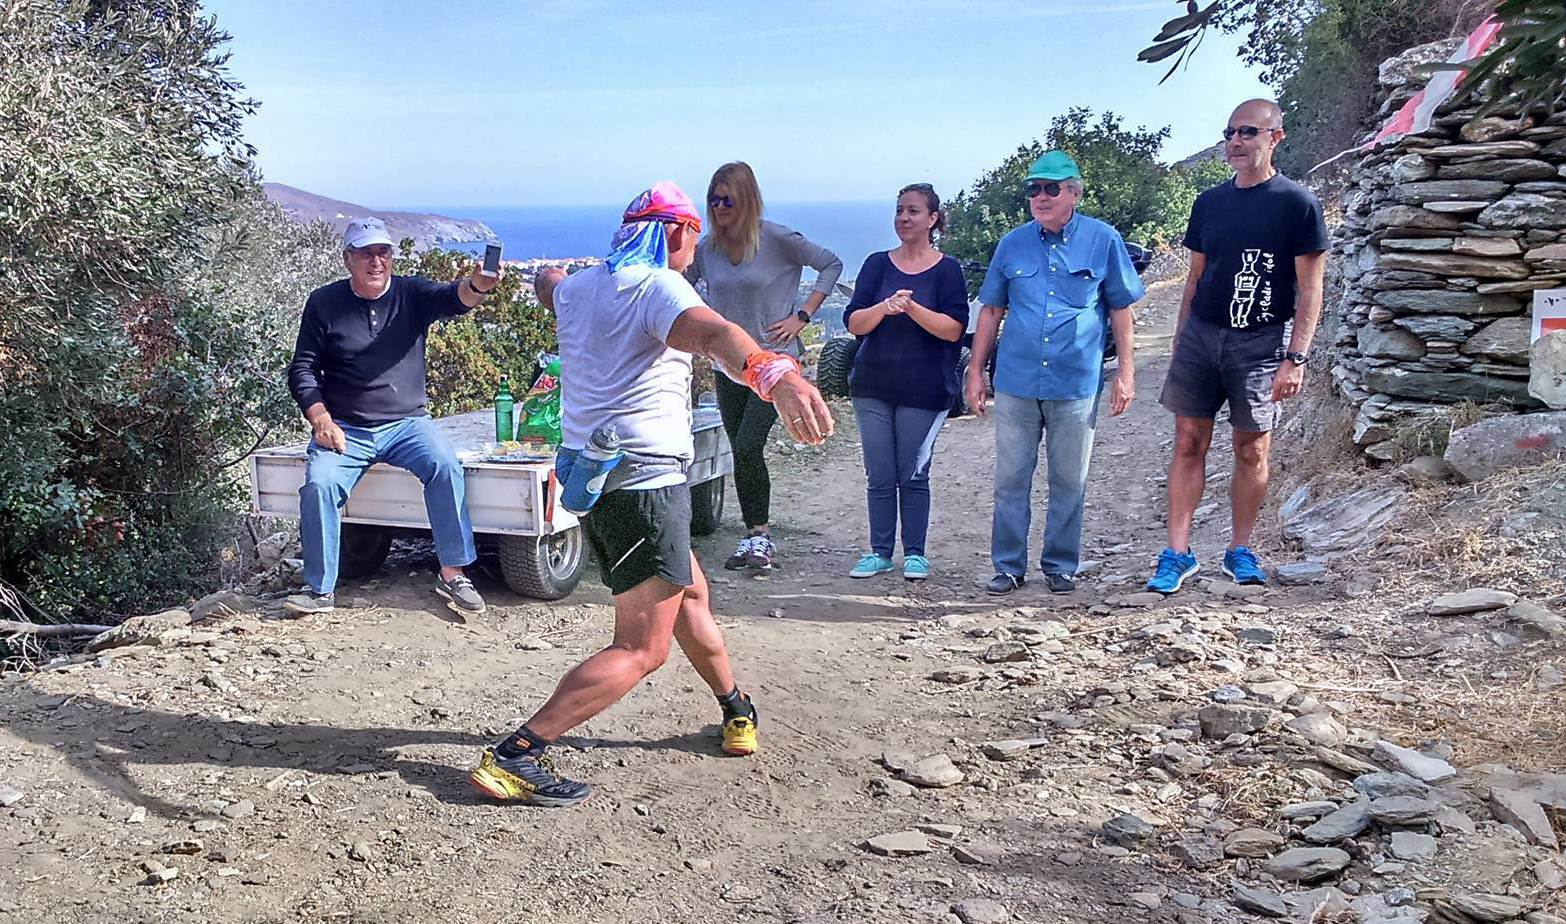 andros-trail-race-leivadia-station-2-oct-hariclia-daniolou-fotos-1